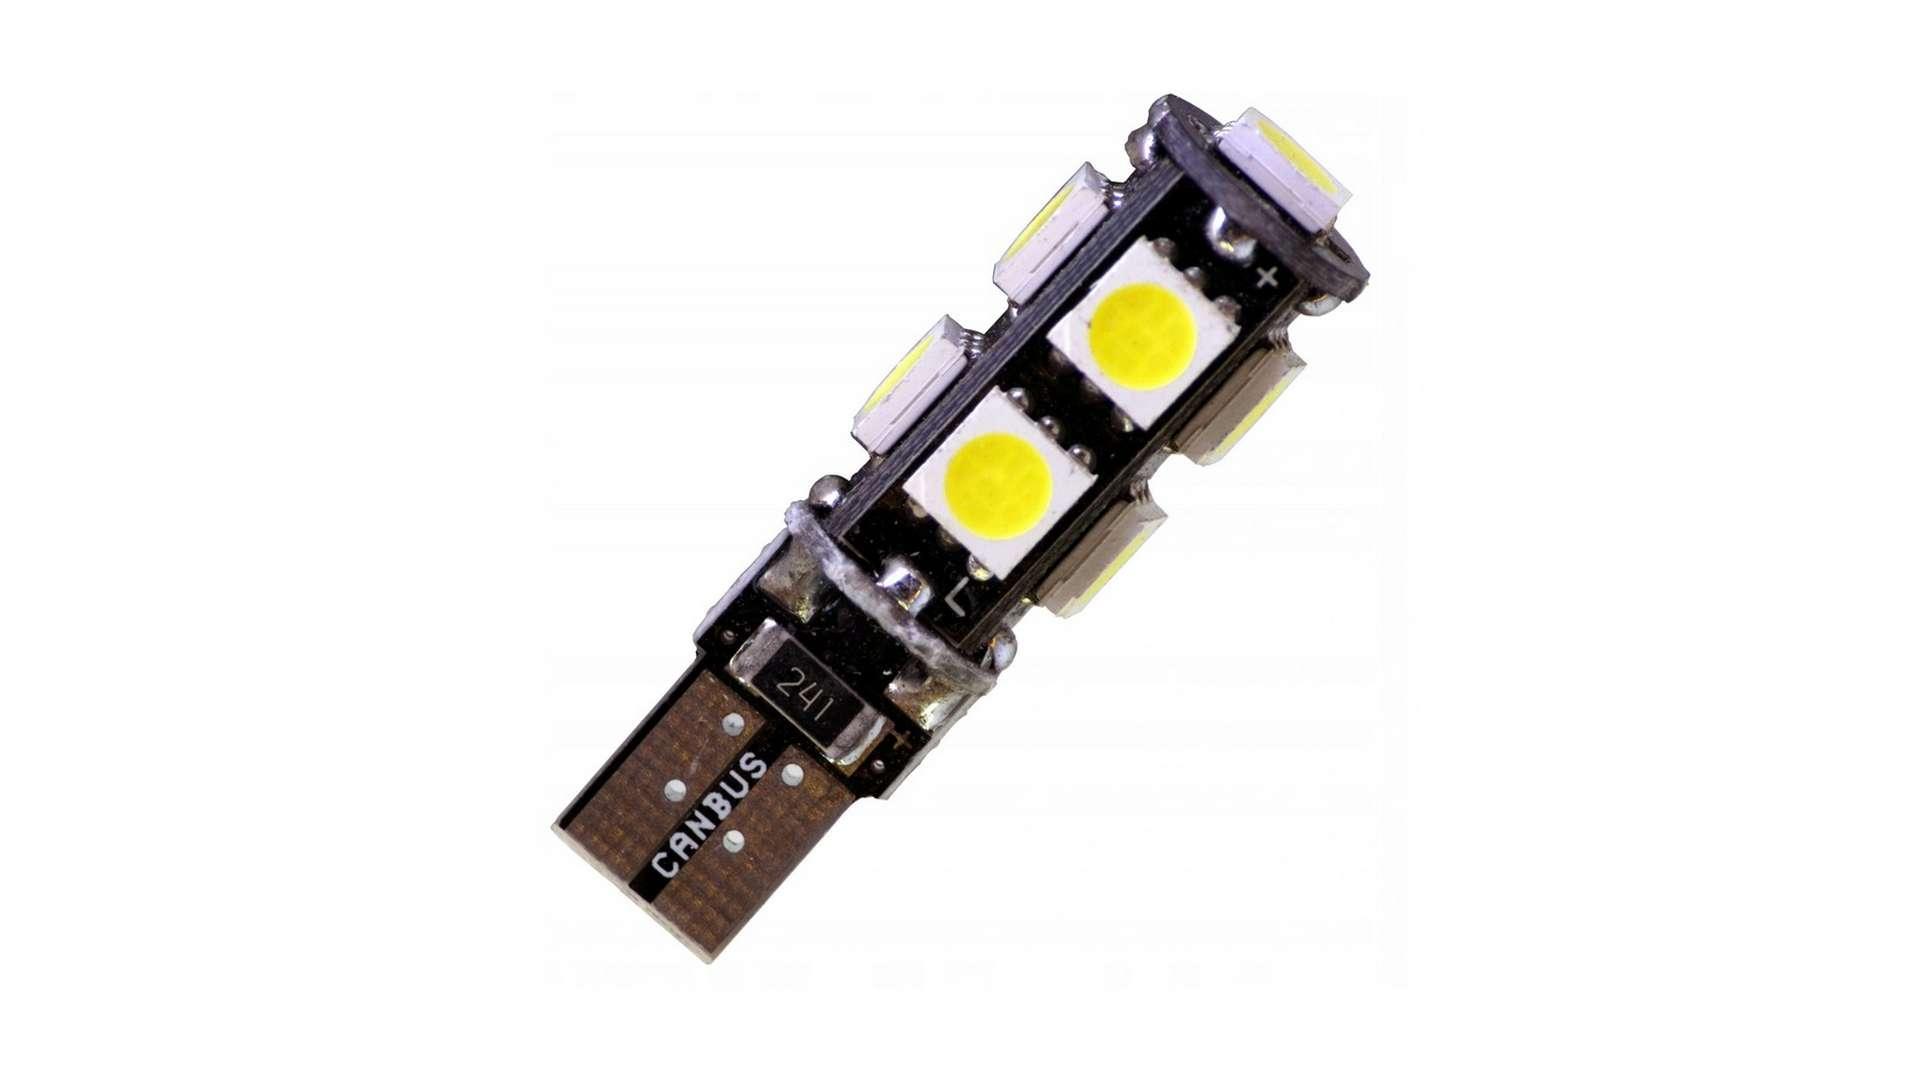 LED LED W5W 9x5050 SMD 12V DC Cold white CANBUS